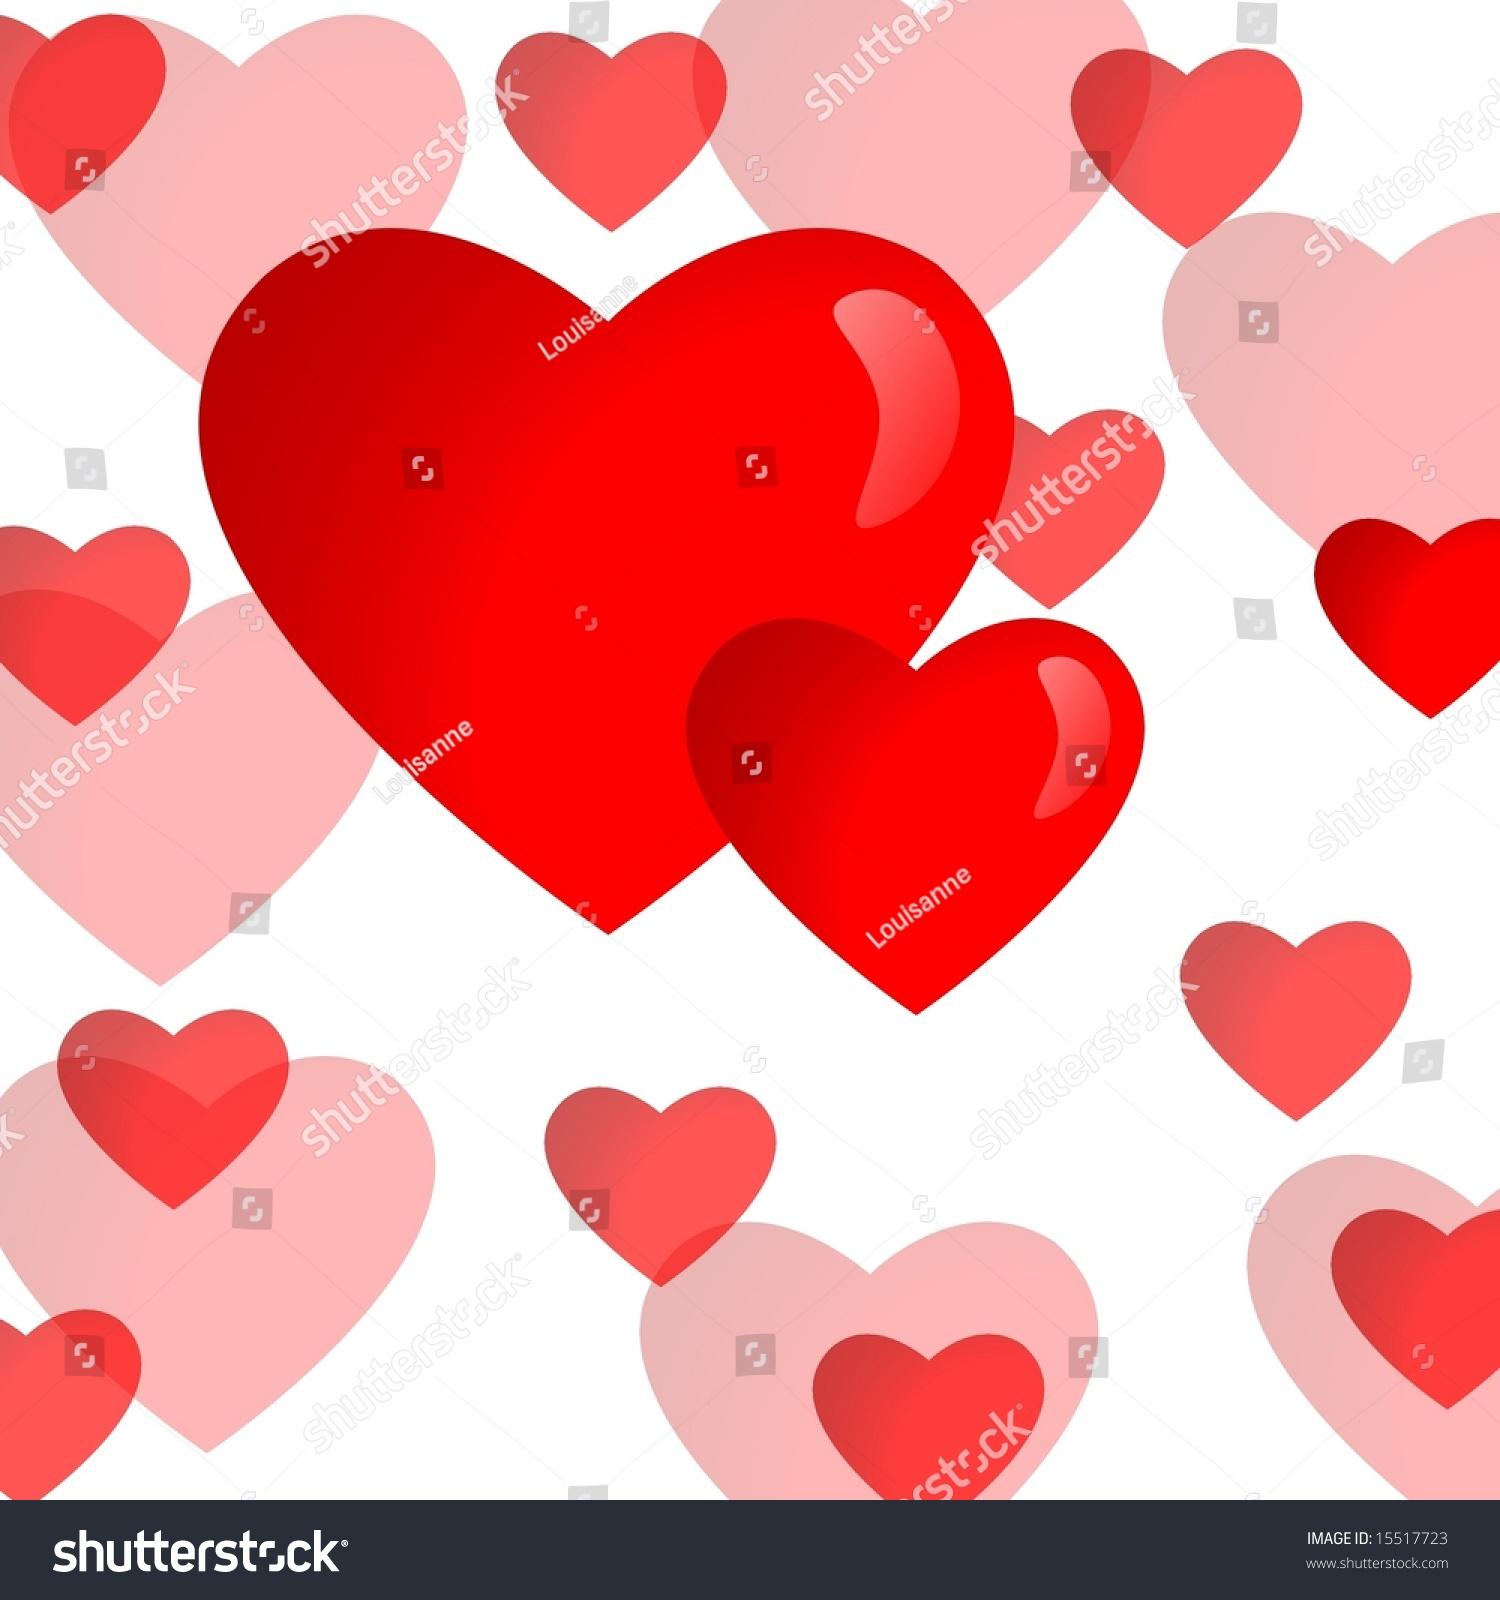 Valentine background illustration red heart symbols stock valentine background illustration with red heart symbols on white background buycottarizona Gallery